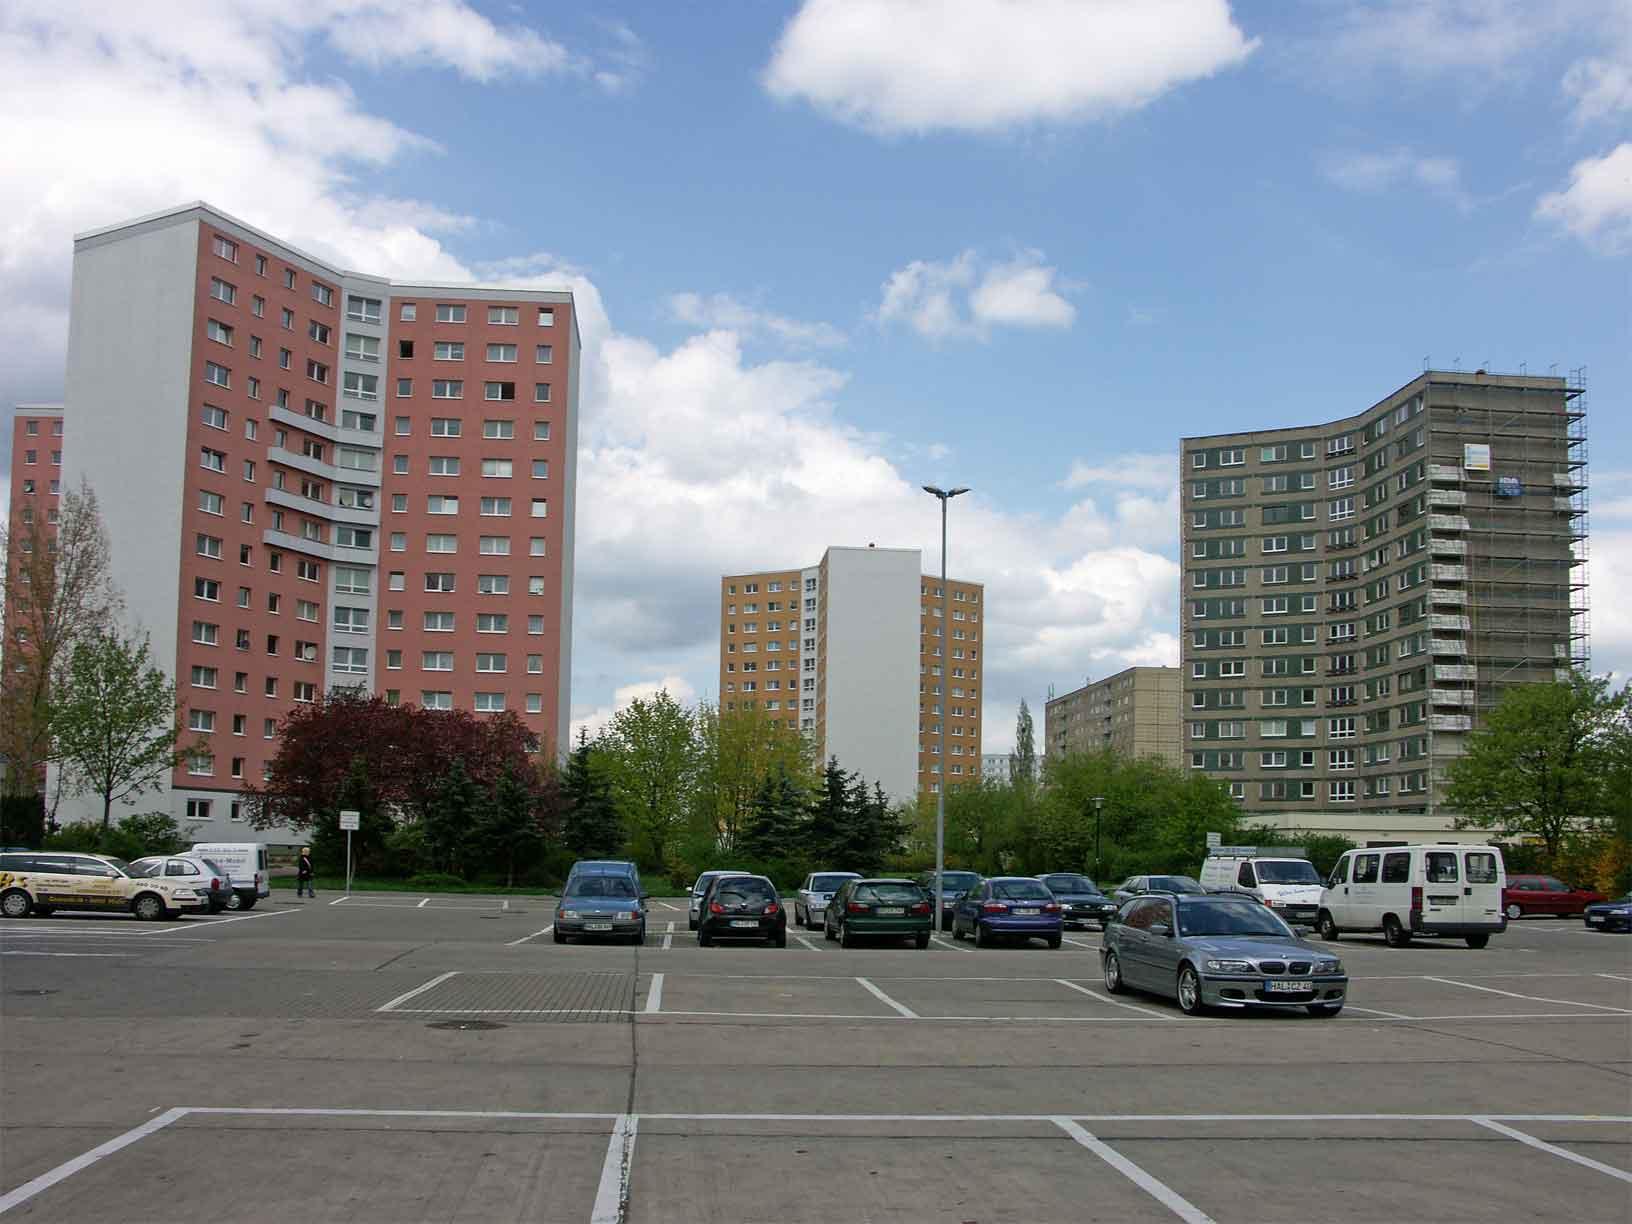 Description y hochhaus halle neustadt